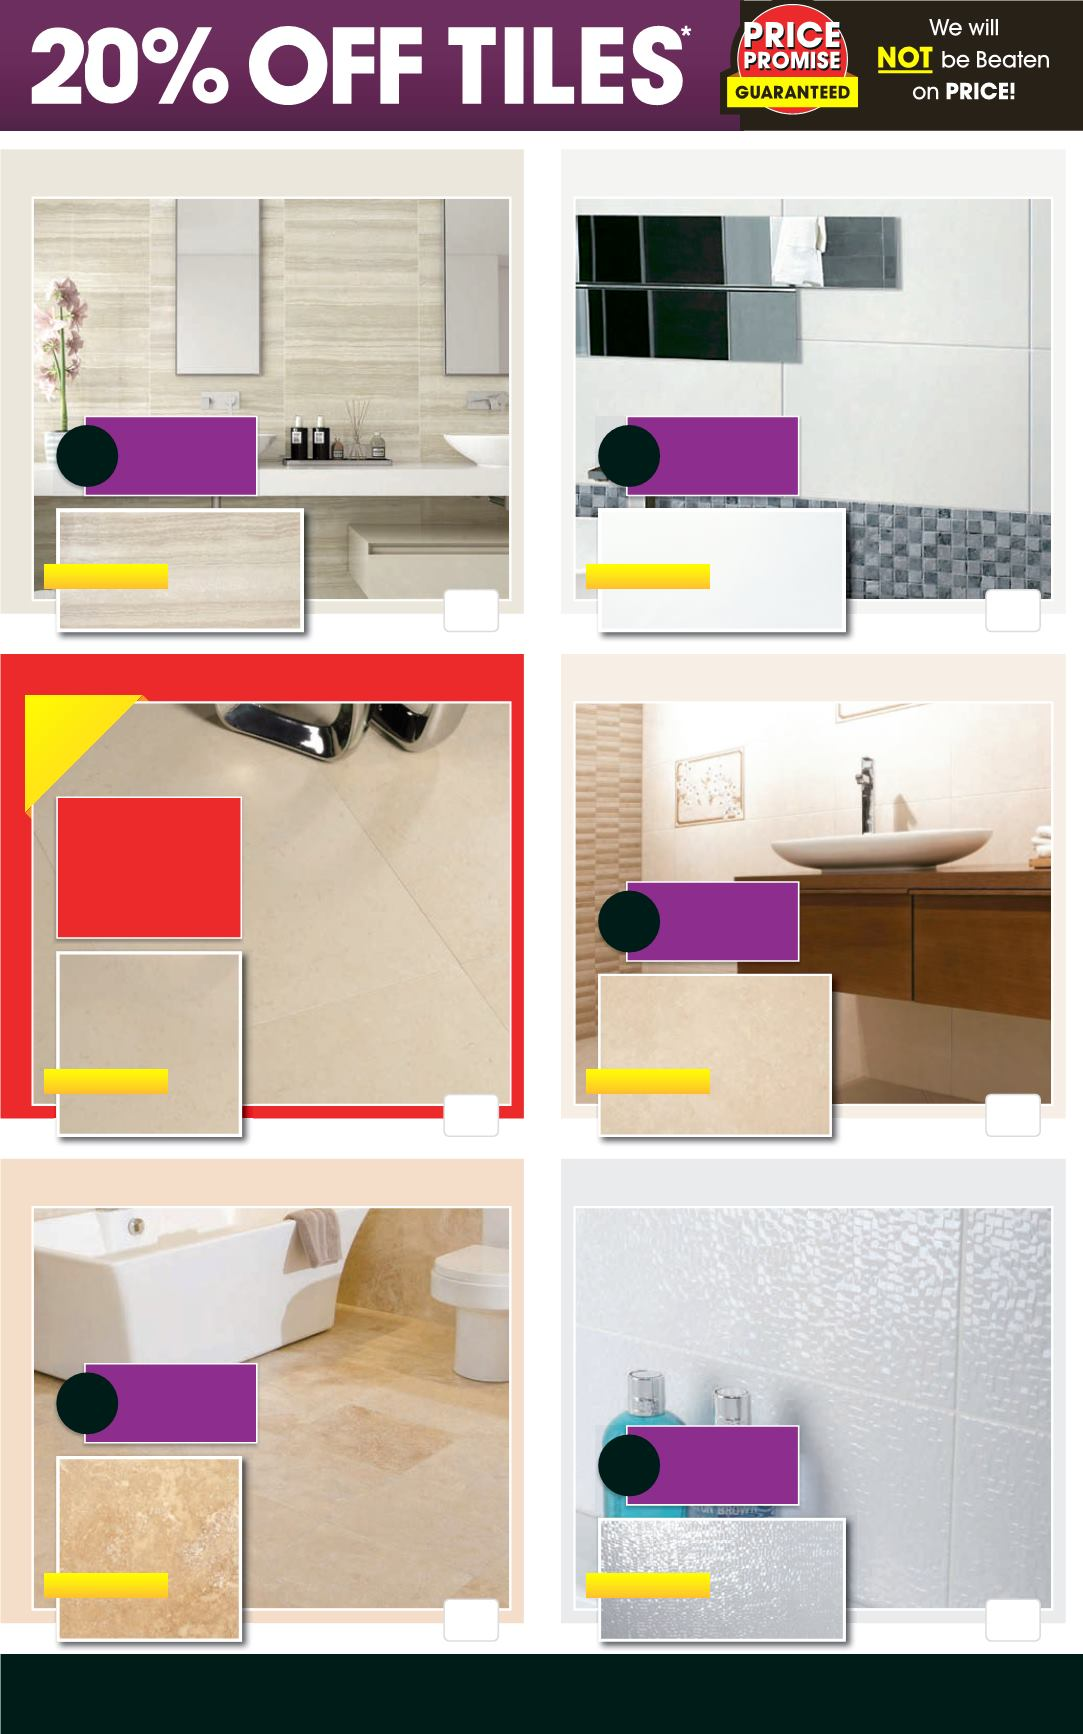 Better bathrooms sale - Better Bathrooms April Showers Sale Deal Sheet Page 14